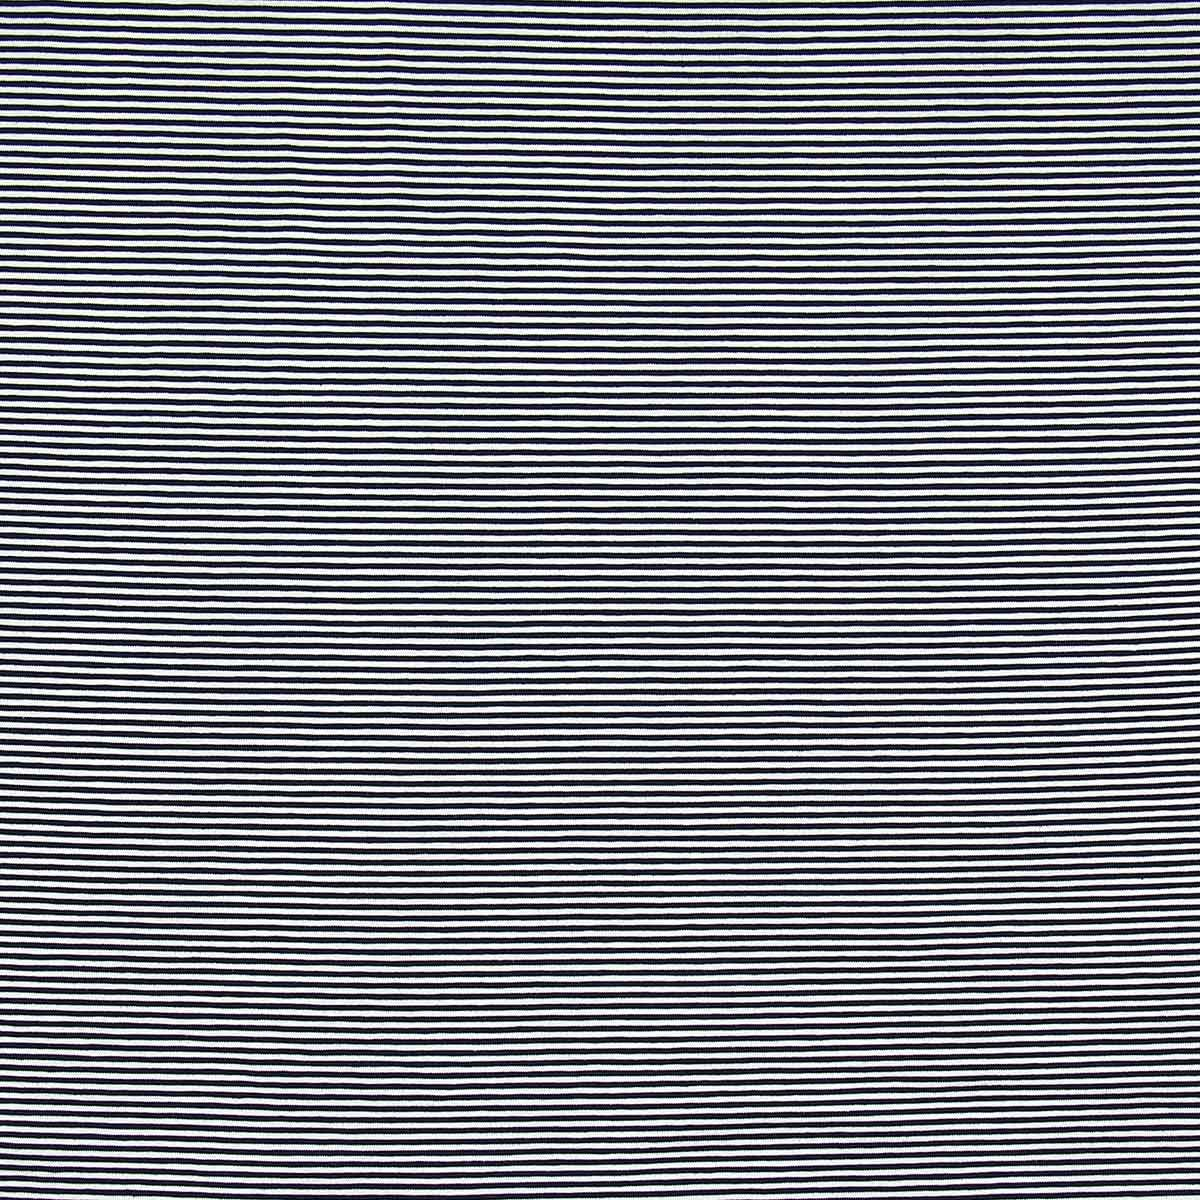 Tissu jersey marinière - Rayures fines bleues